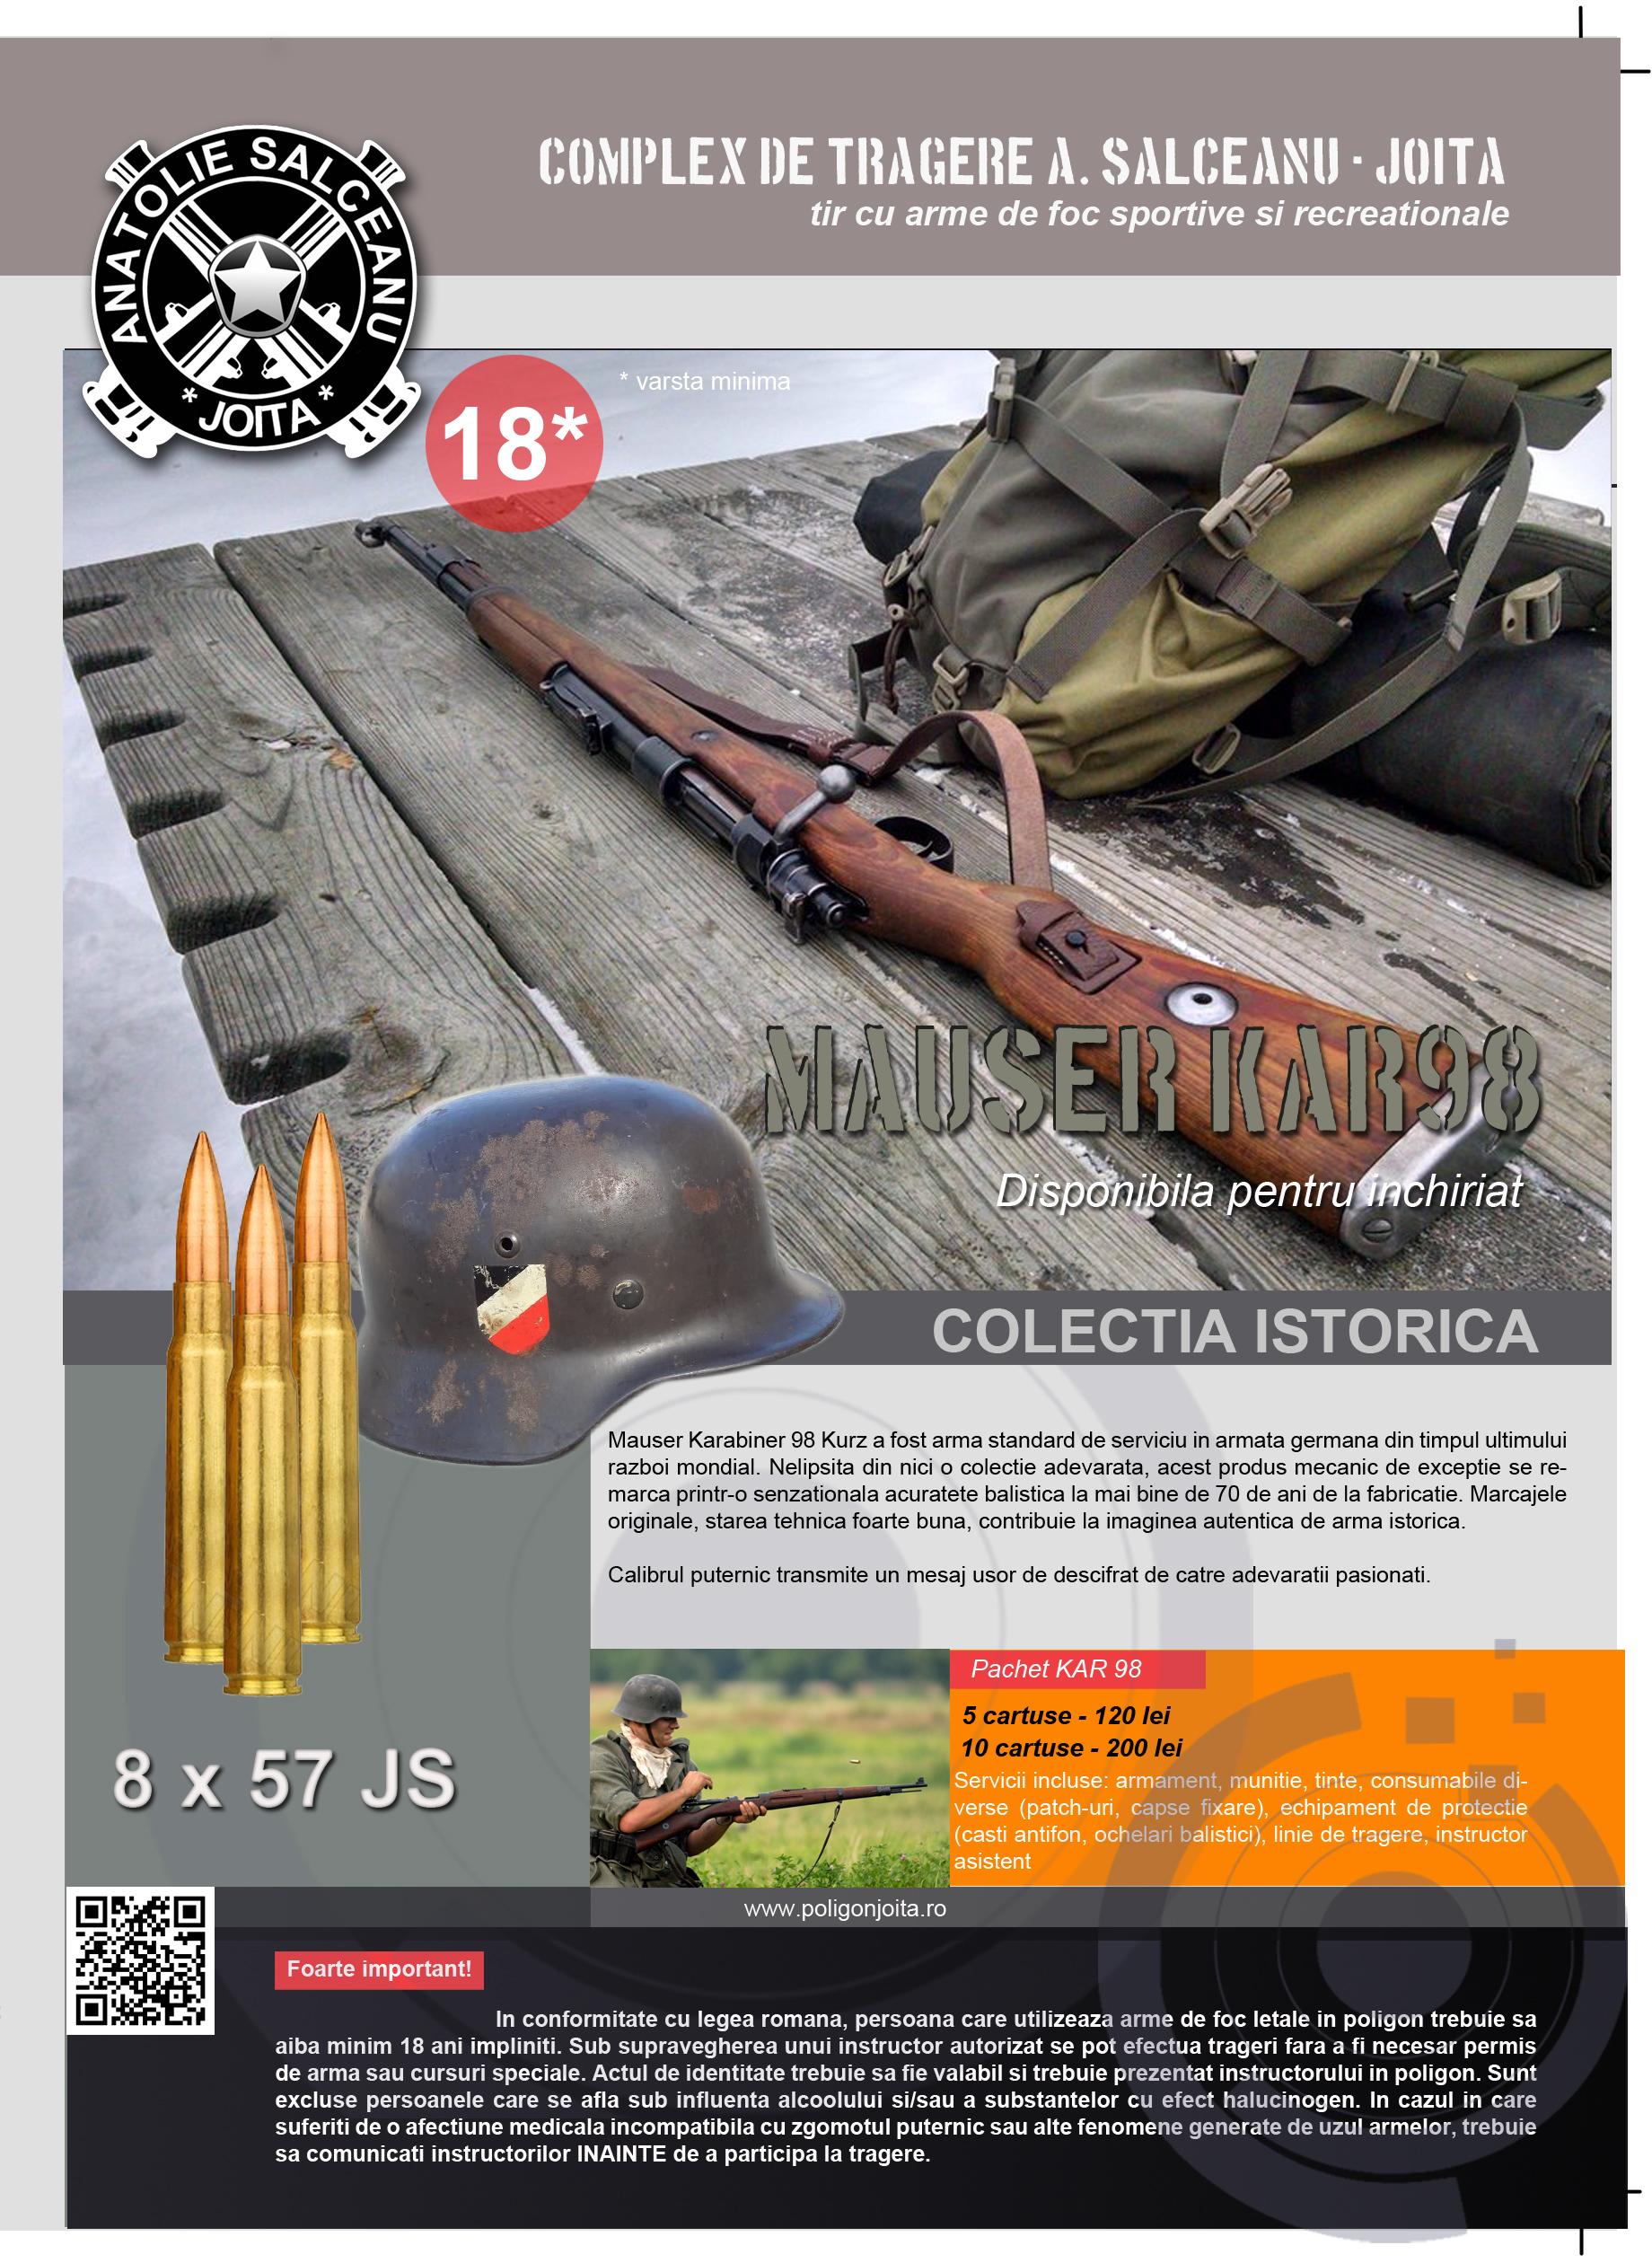 Plansa Mauser KAR 98